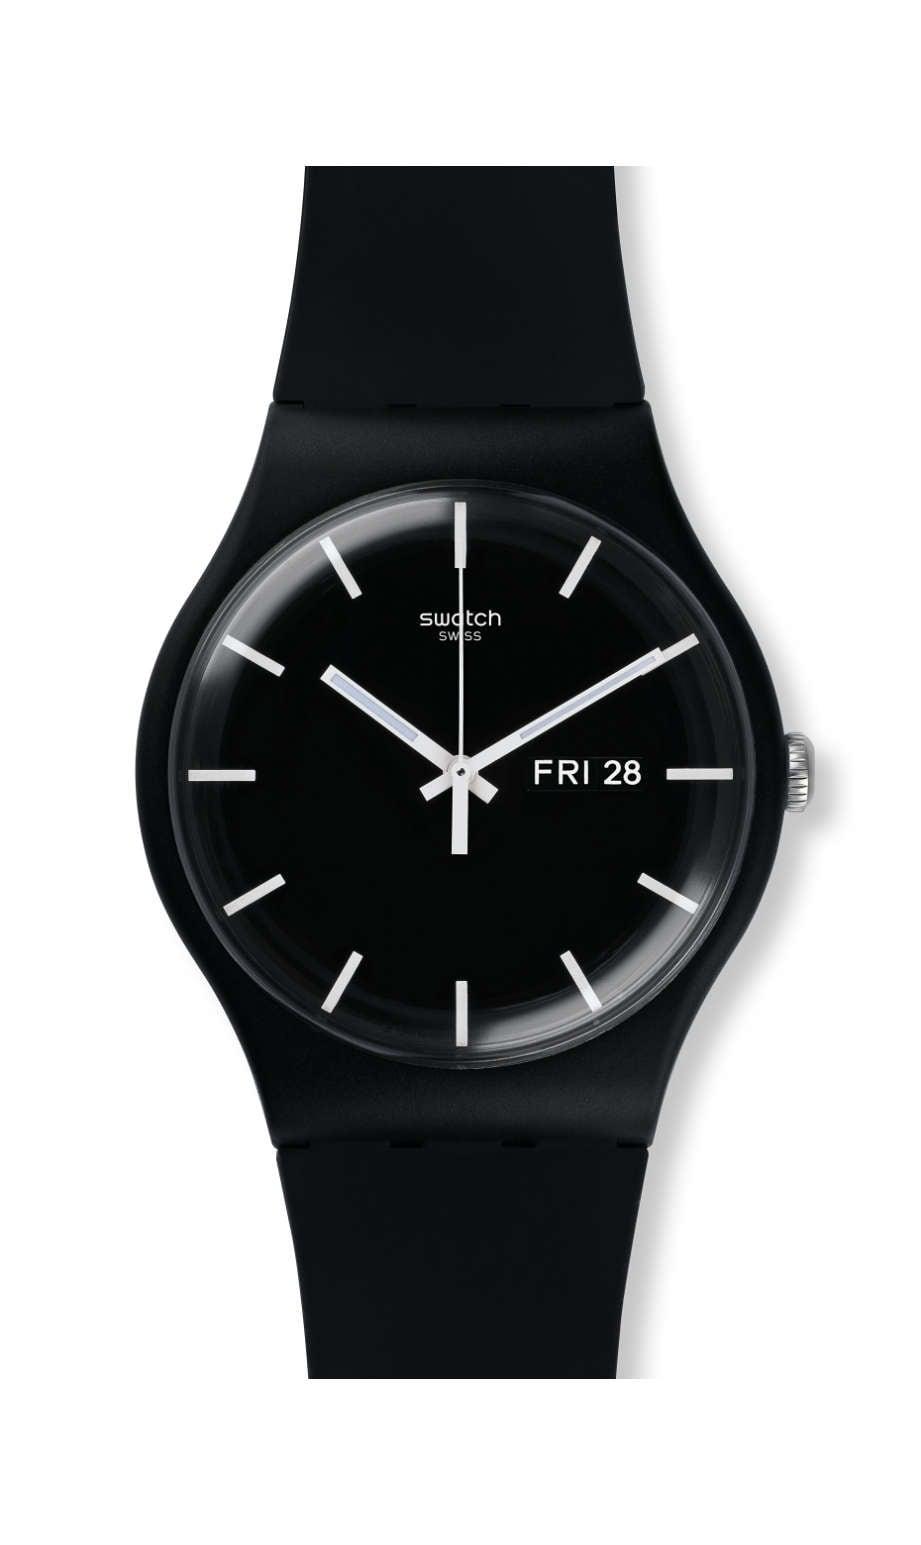 Swatch - MONO BLACK - 1